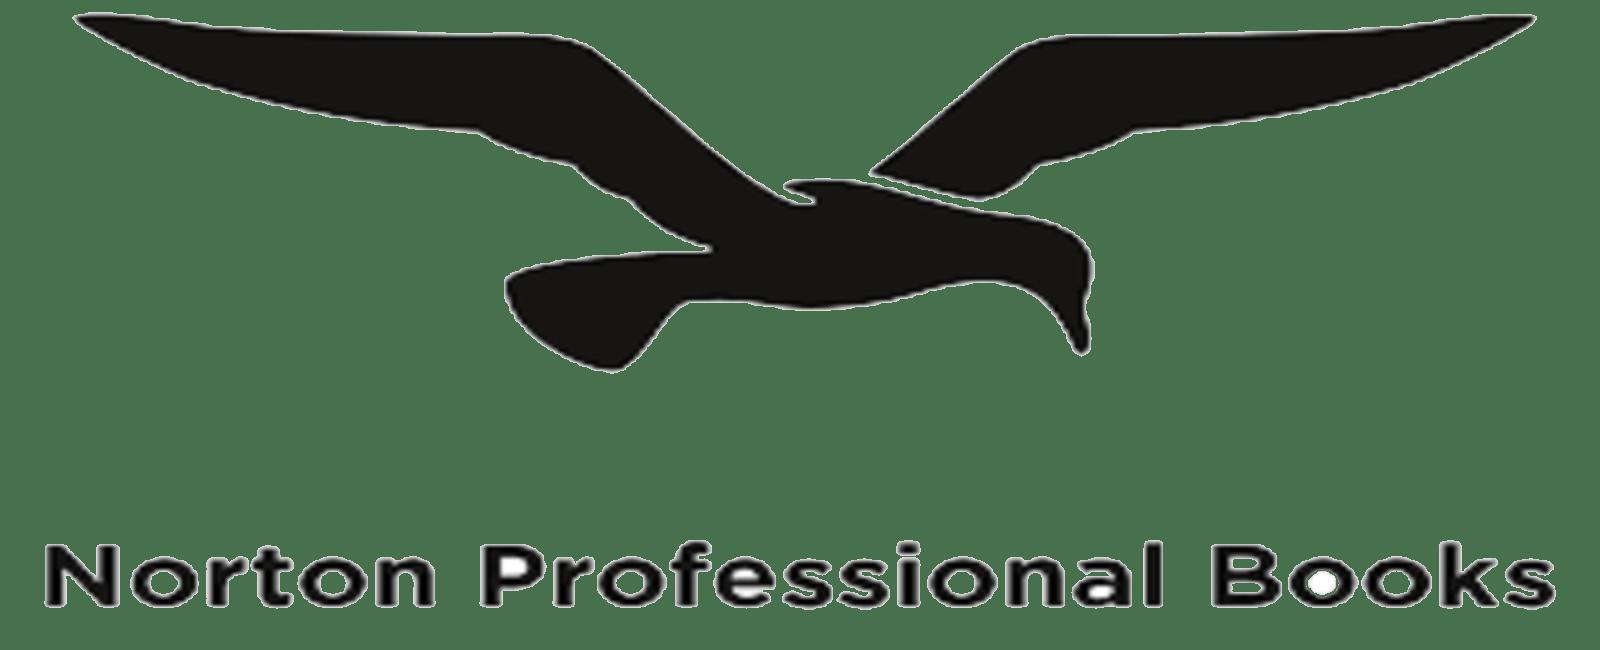 Norton Professional Books